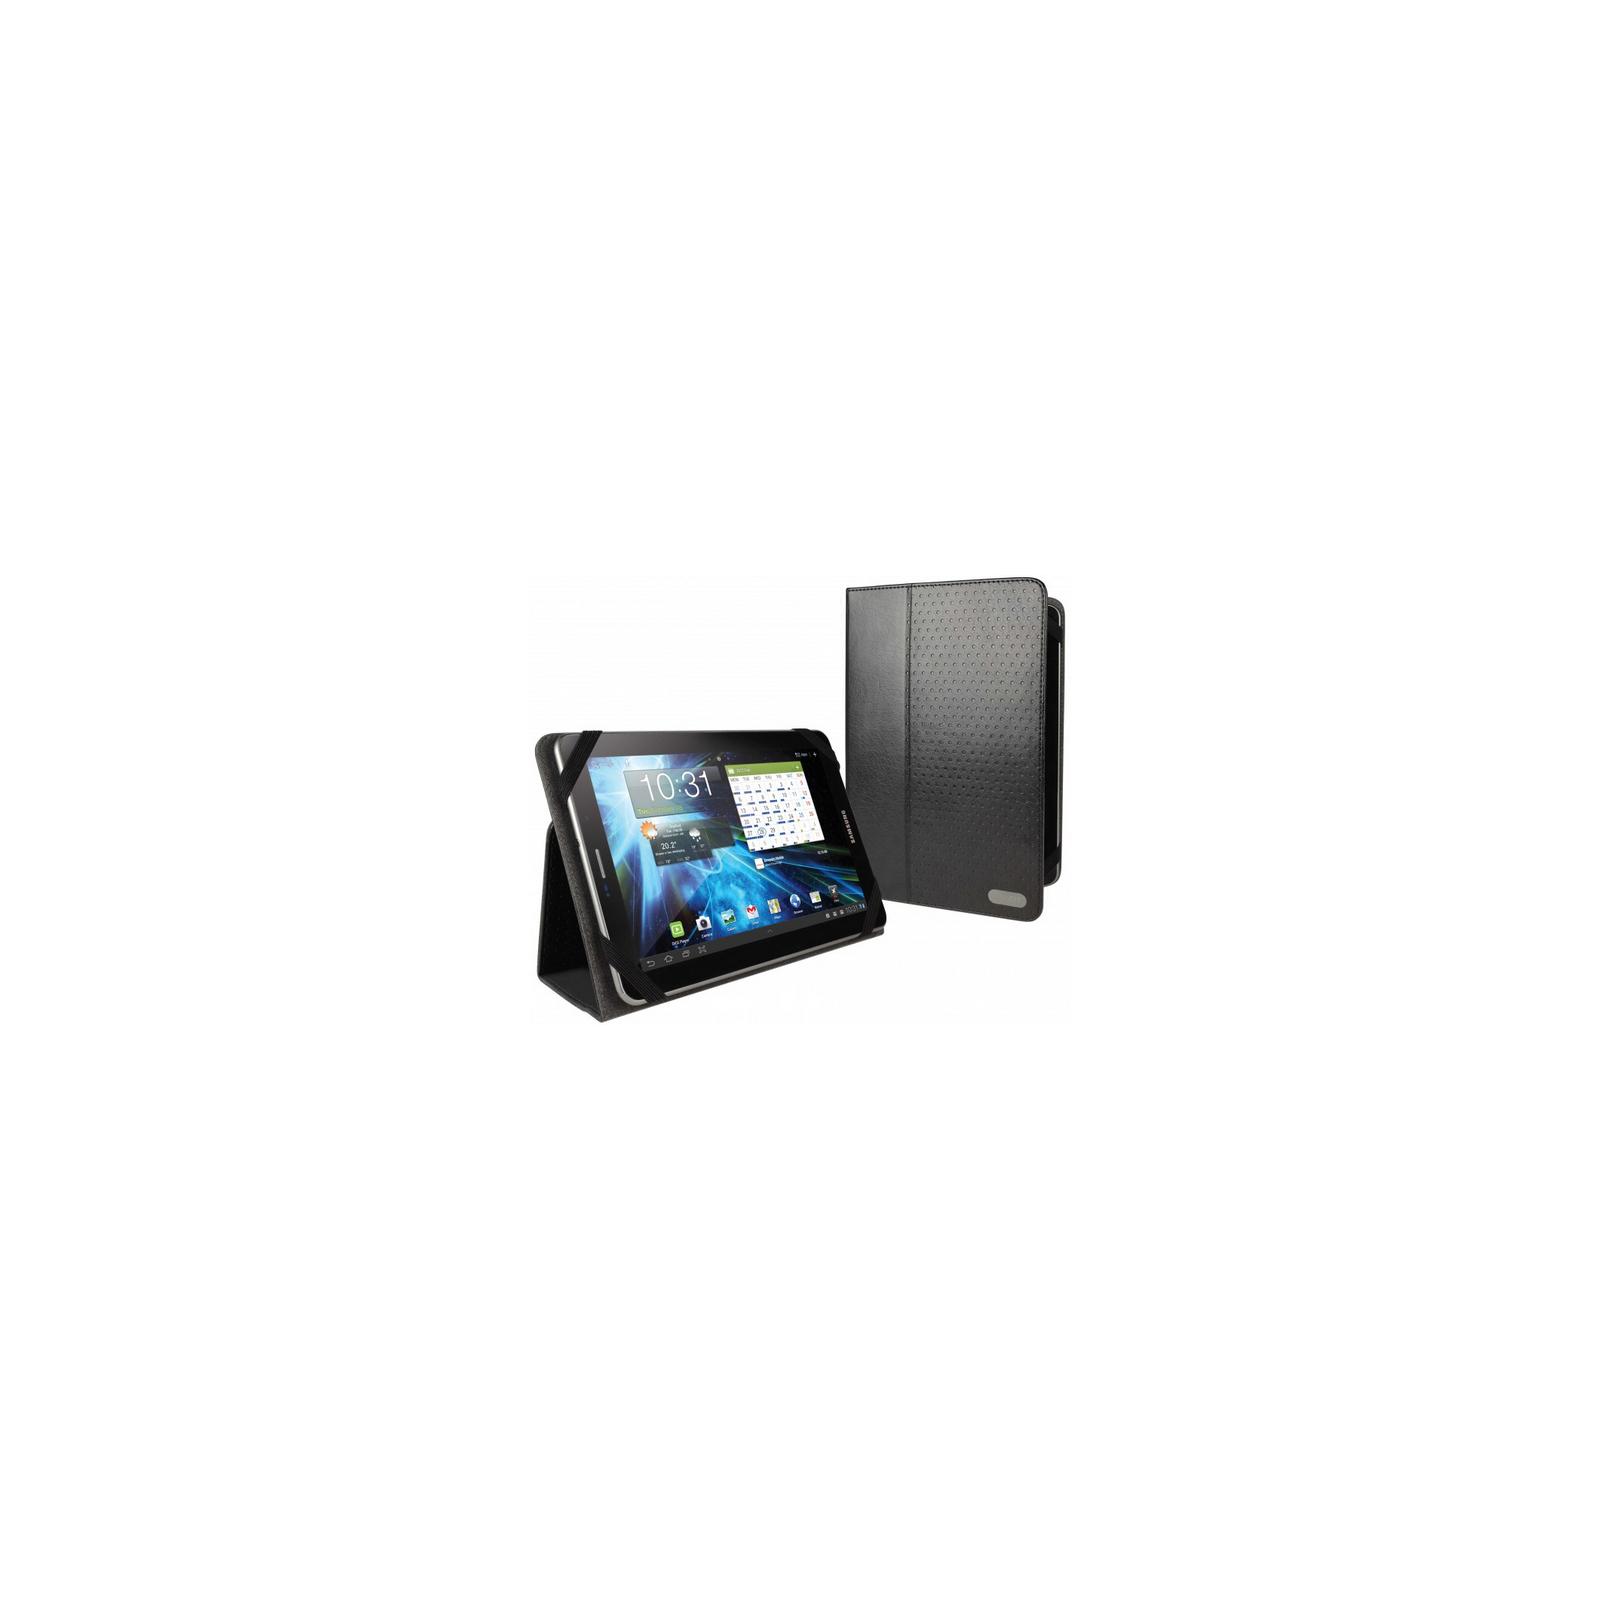 "Чехол для планшета CYGNETT 7"" Archive Universal Tablet Case (CY1300UNARC)"